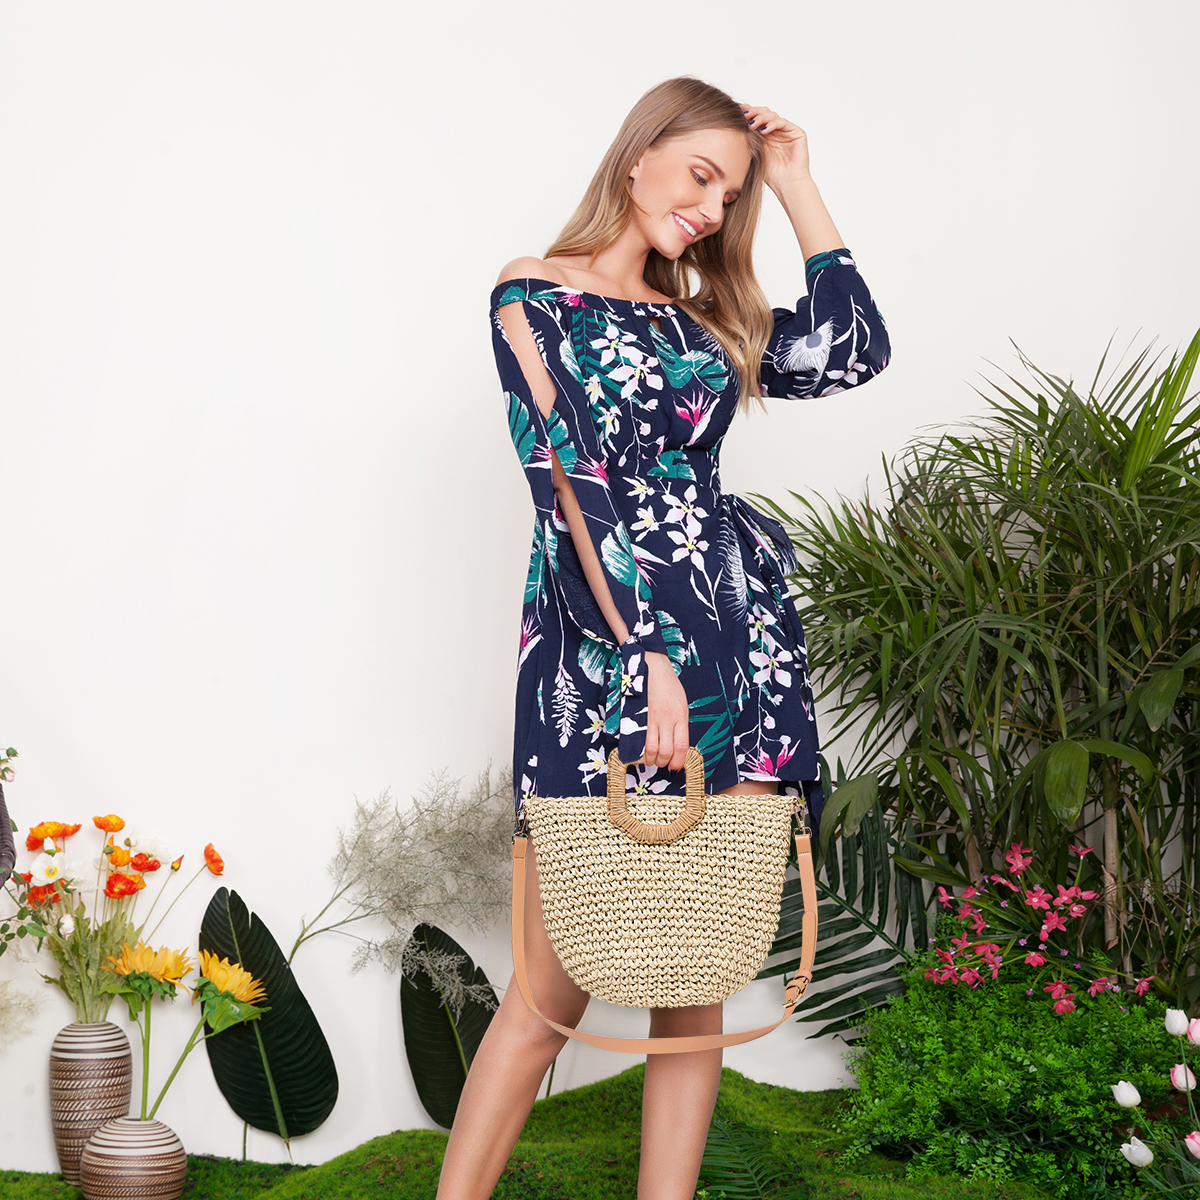 Women Summer Beach Bag Travel Straw Top Handle Big Capacity Handbag